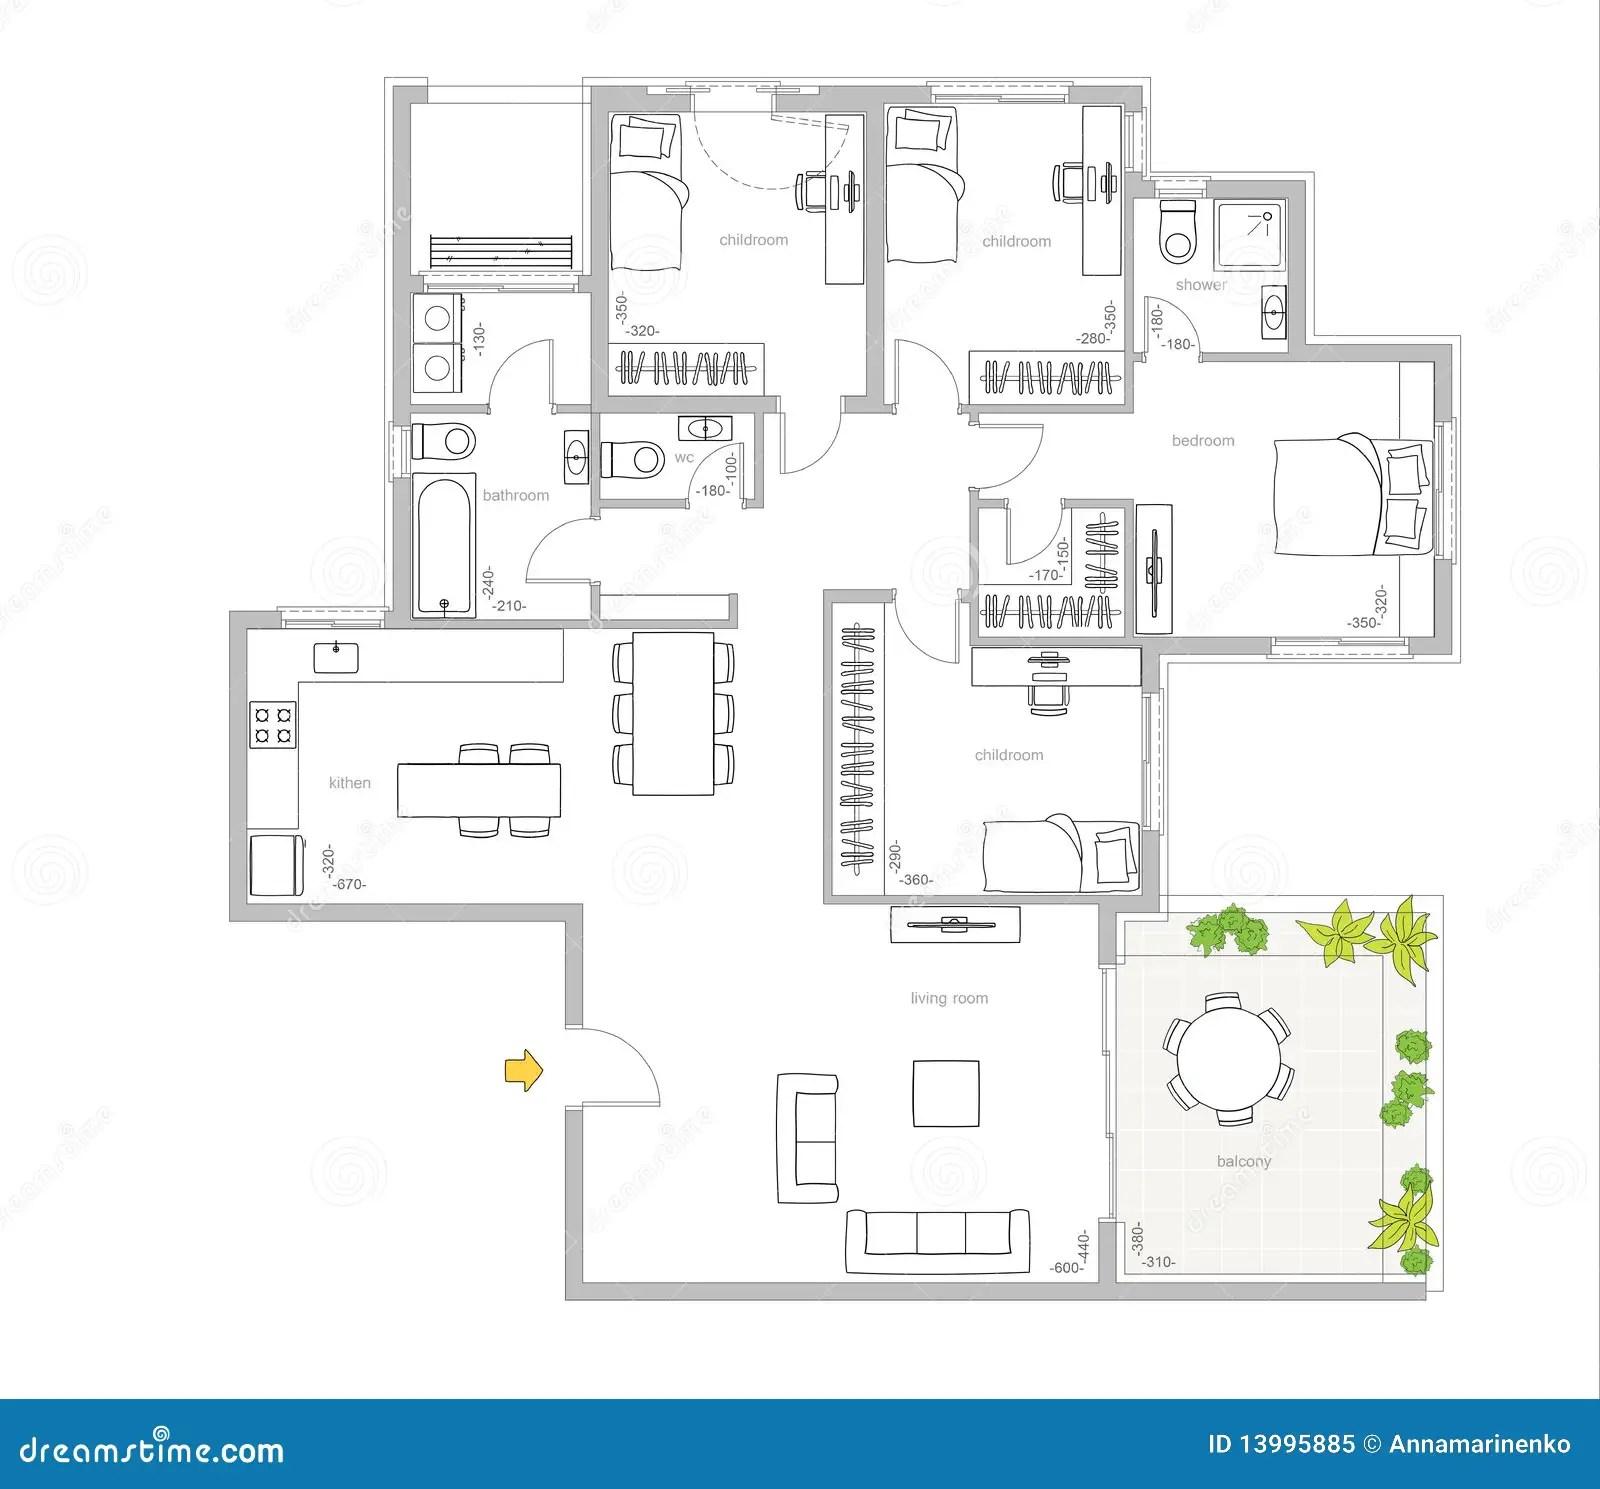 Interior Design Royalty Free Stock Photo - Image: 13995885